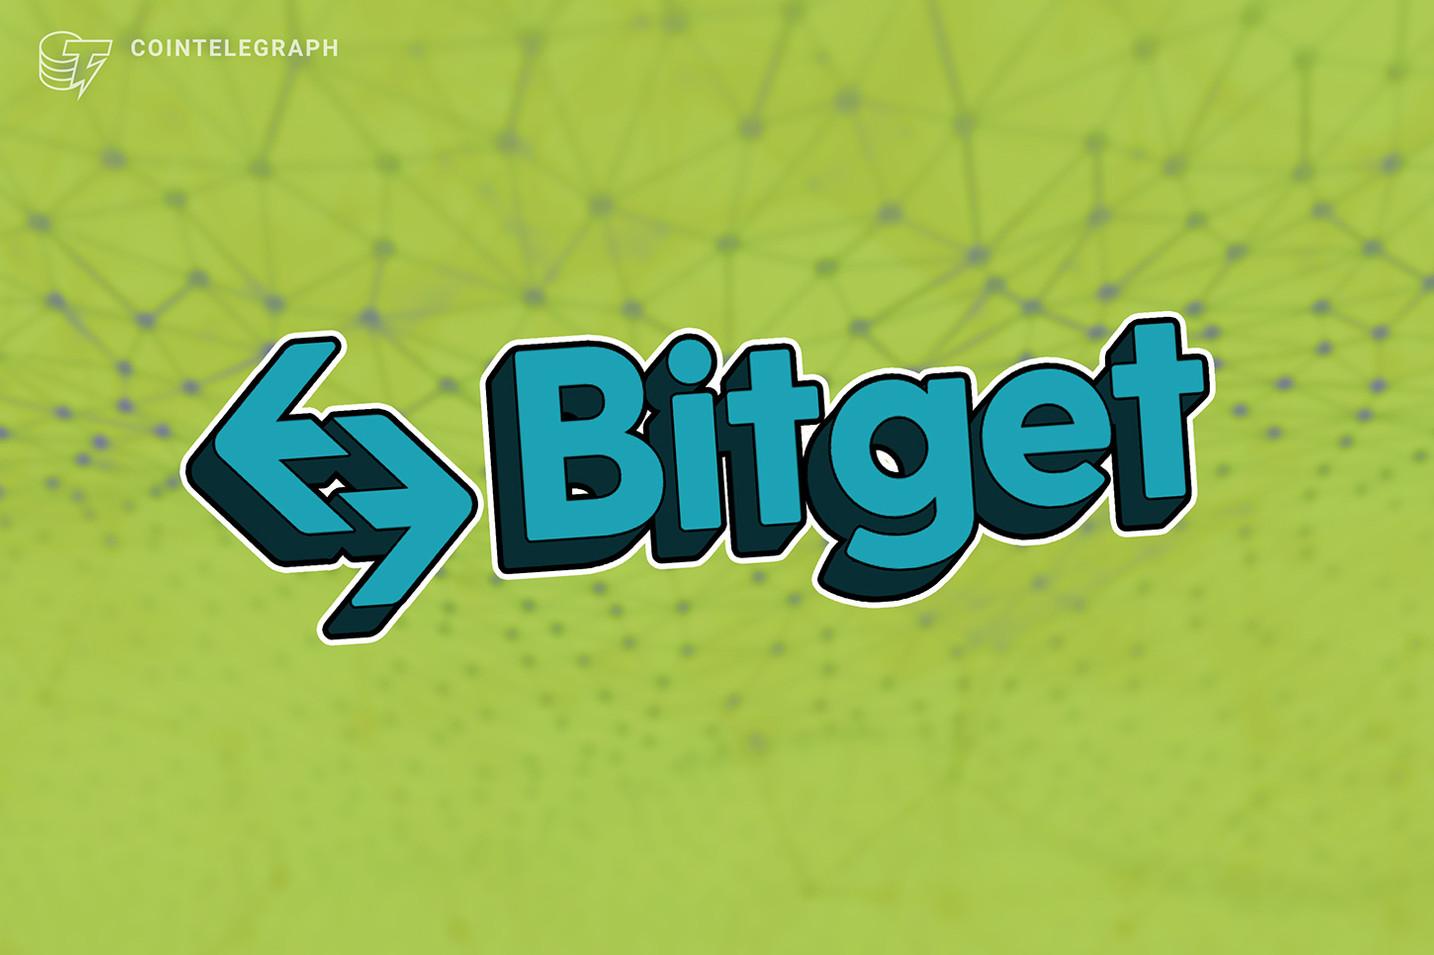 Bitget KCGI registration starts on Oct. 20 with 100 BTC up for grabs